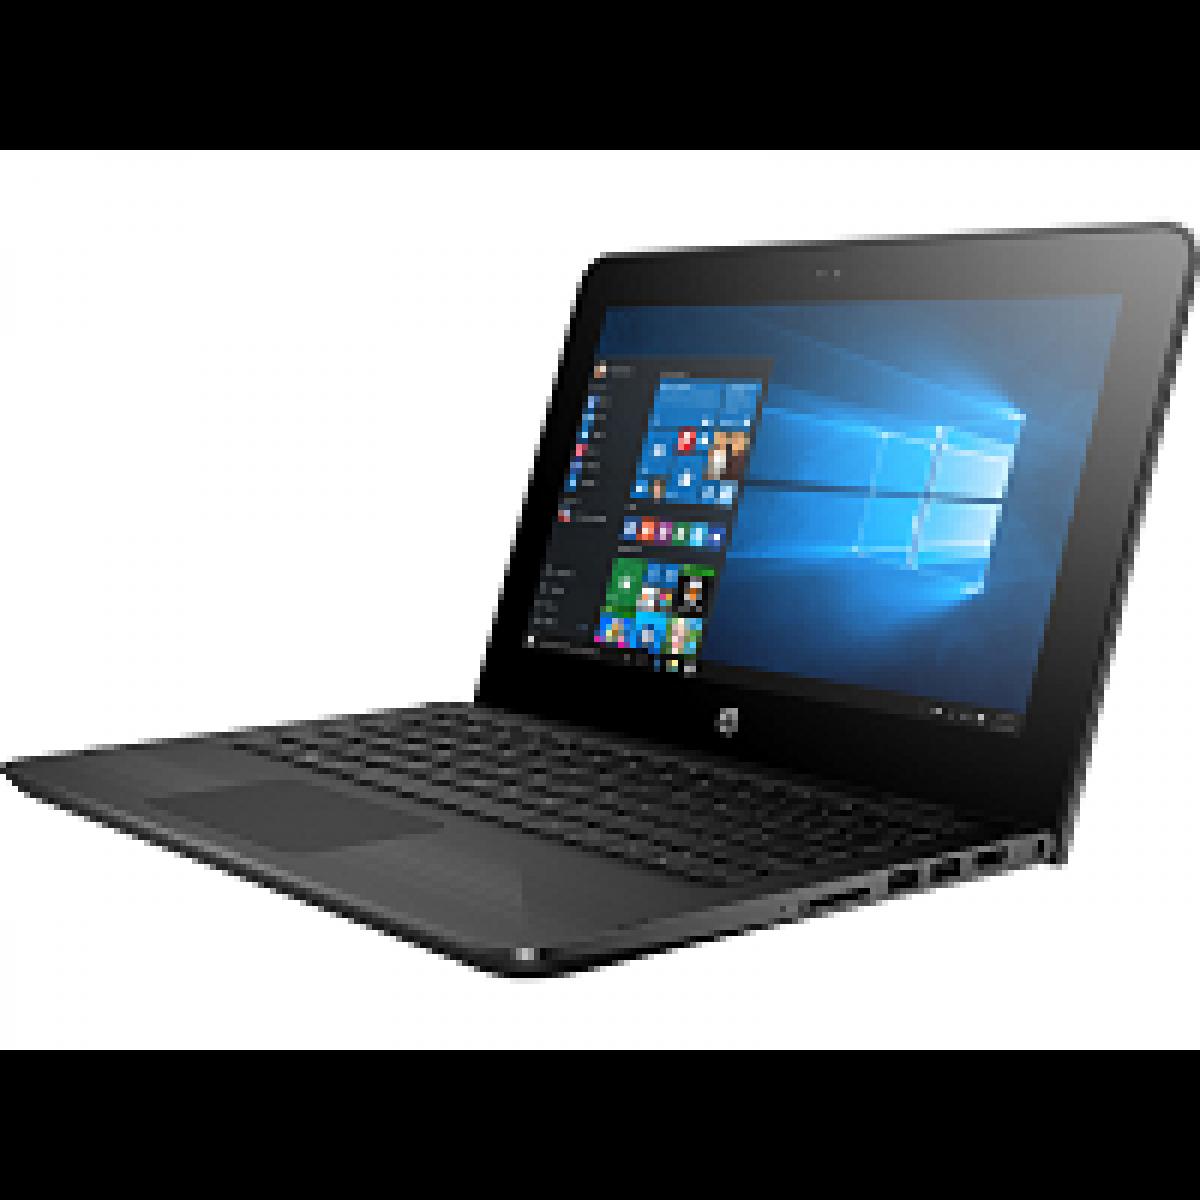 Resultado De Imagen Para Notebook Png Laptop Pc Laptop Electronic Products